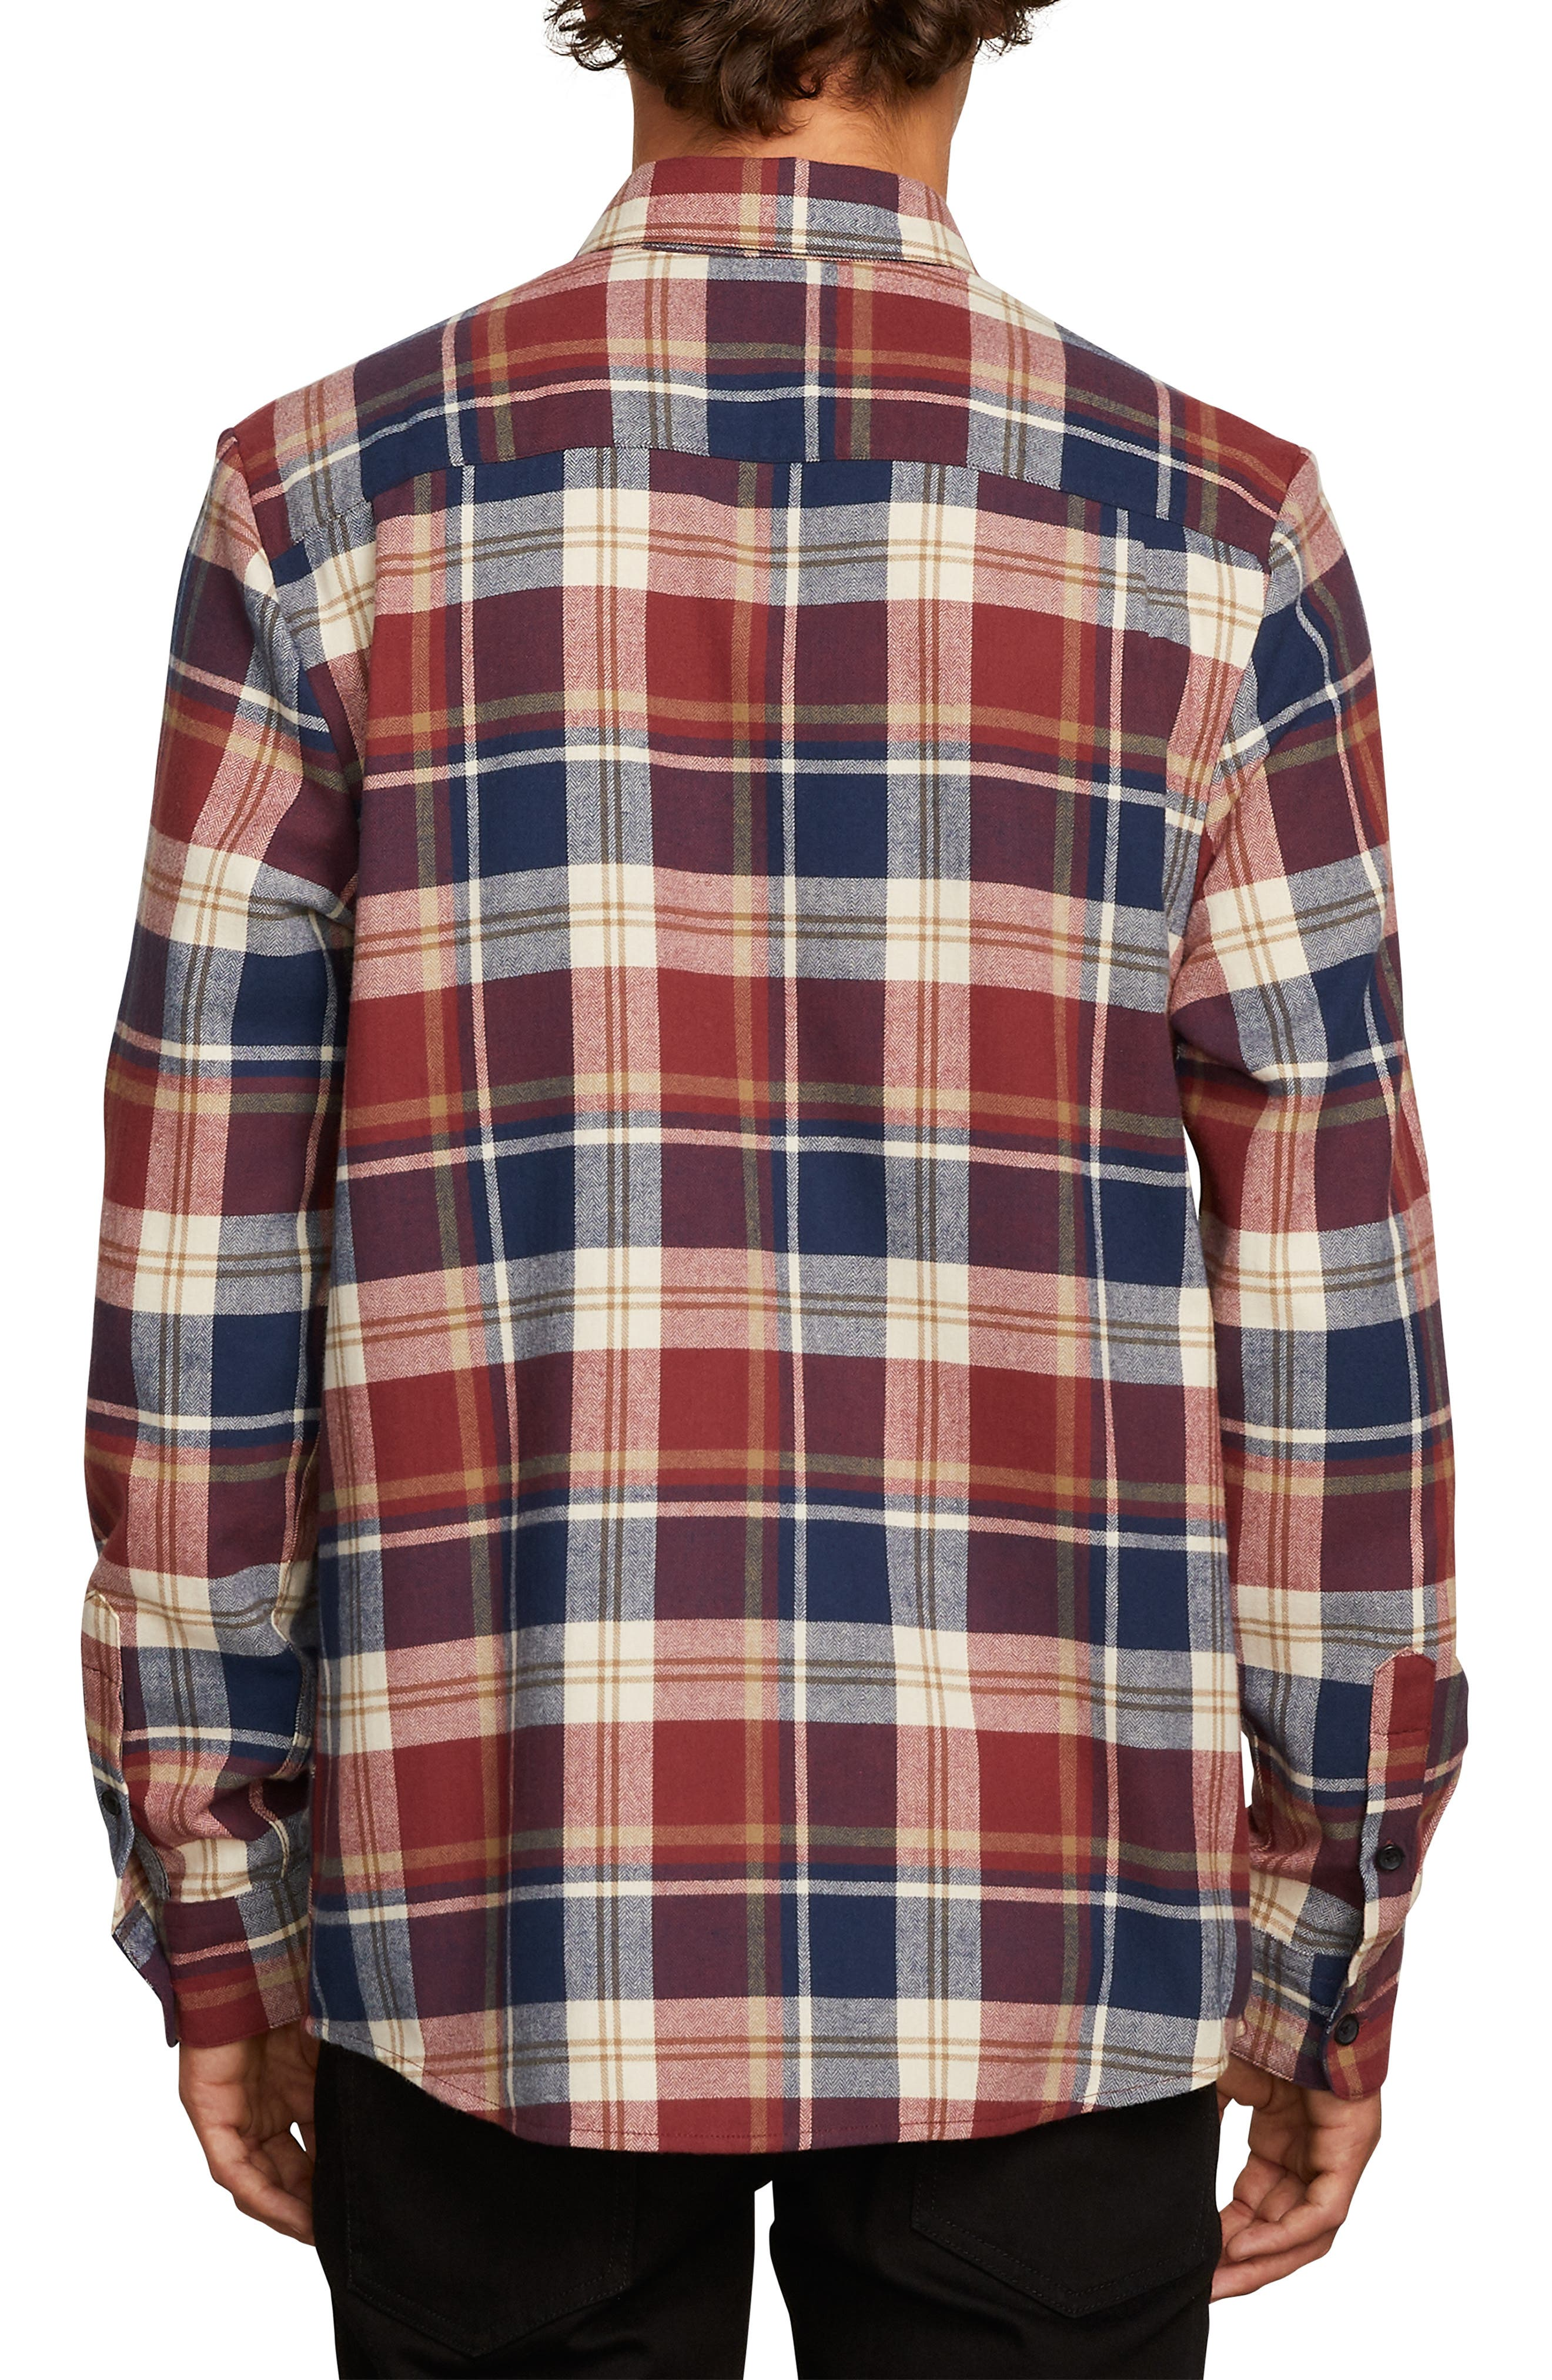 Caden Plaid Flannel Shirt,                             Alternate thumbnail 2, color,                             MELINDIGO